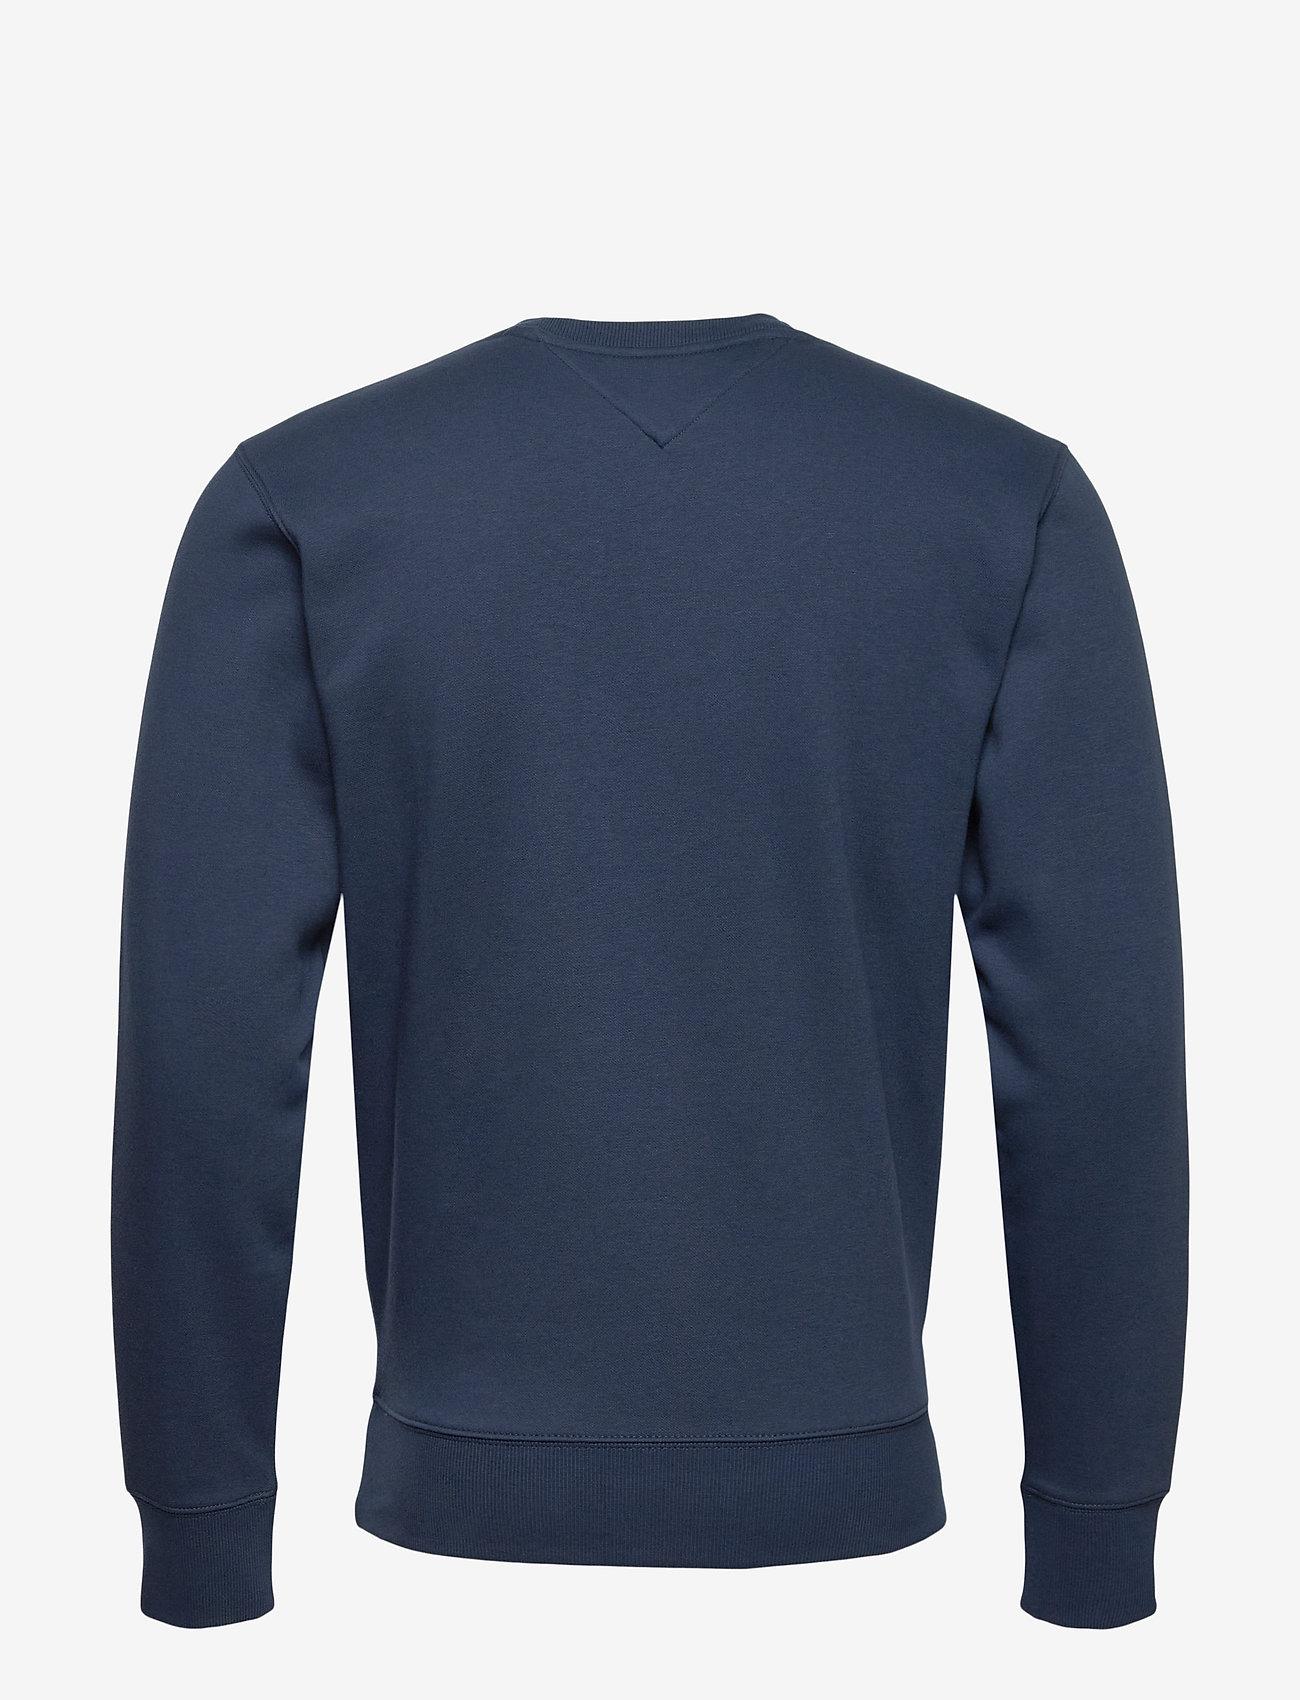 Tommy Jeans - TJM REGULAR FLEECE C NECK - kläder - twilight navy - 1